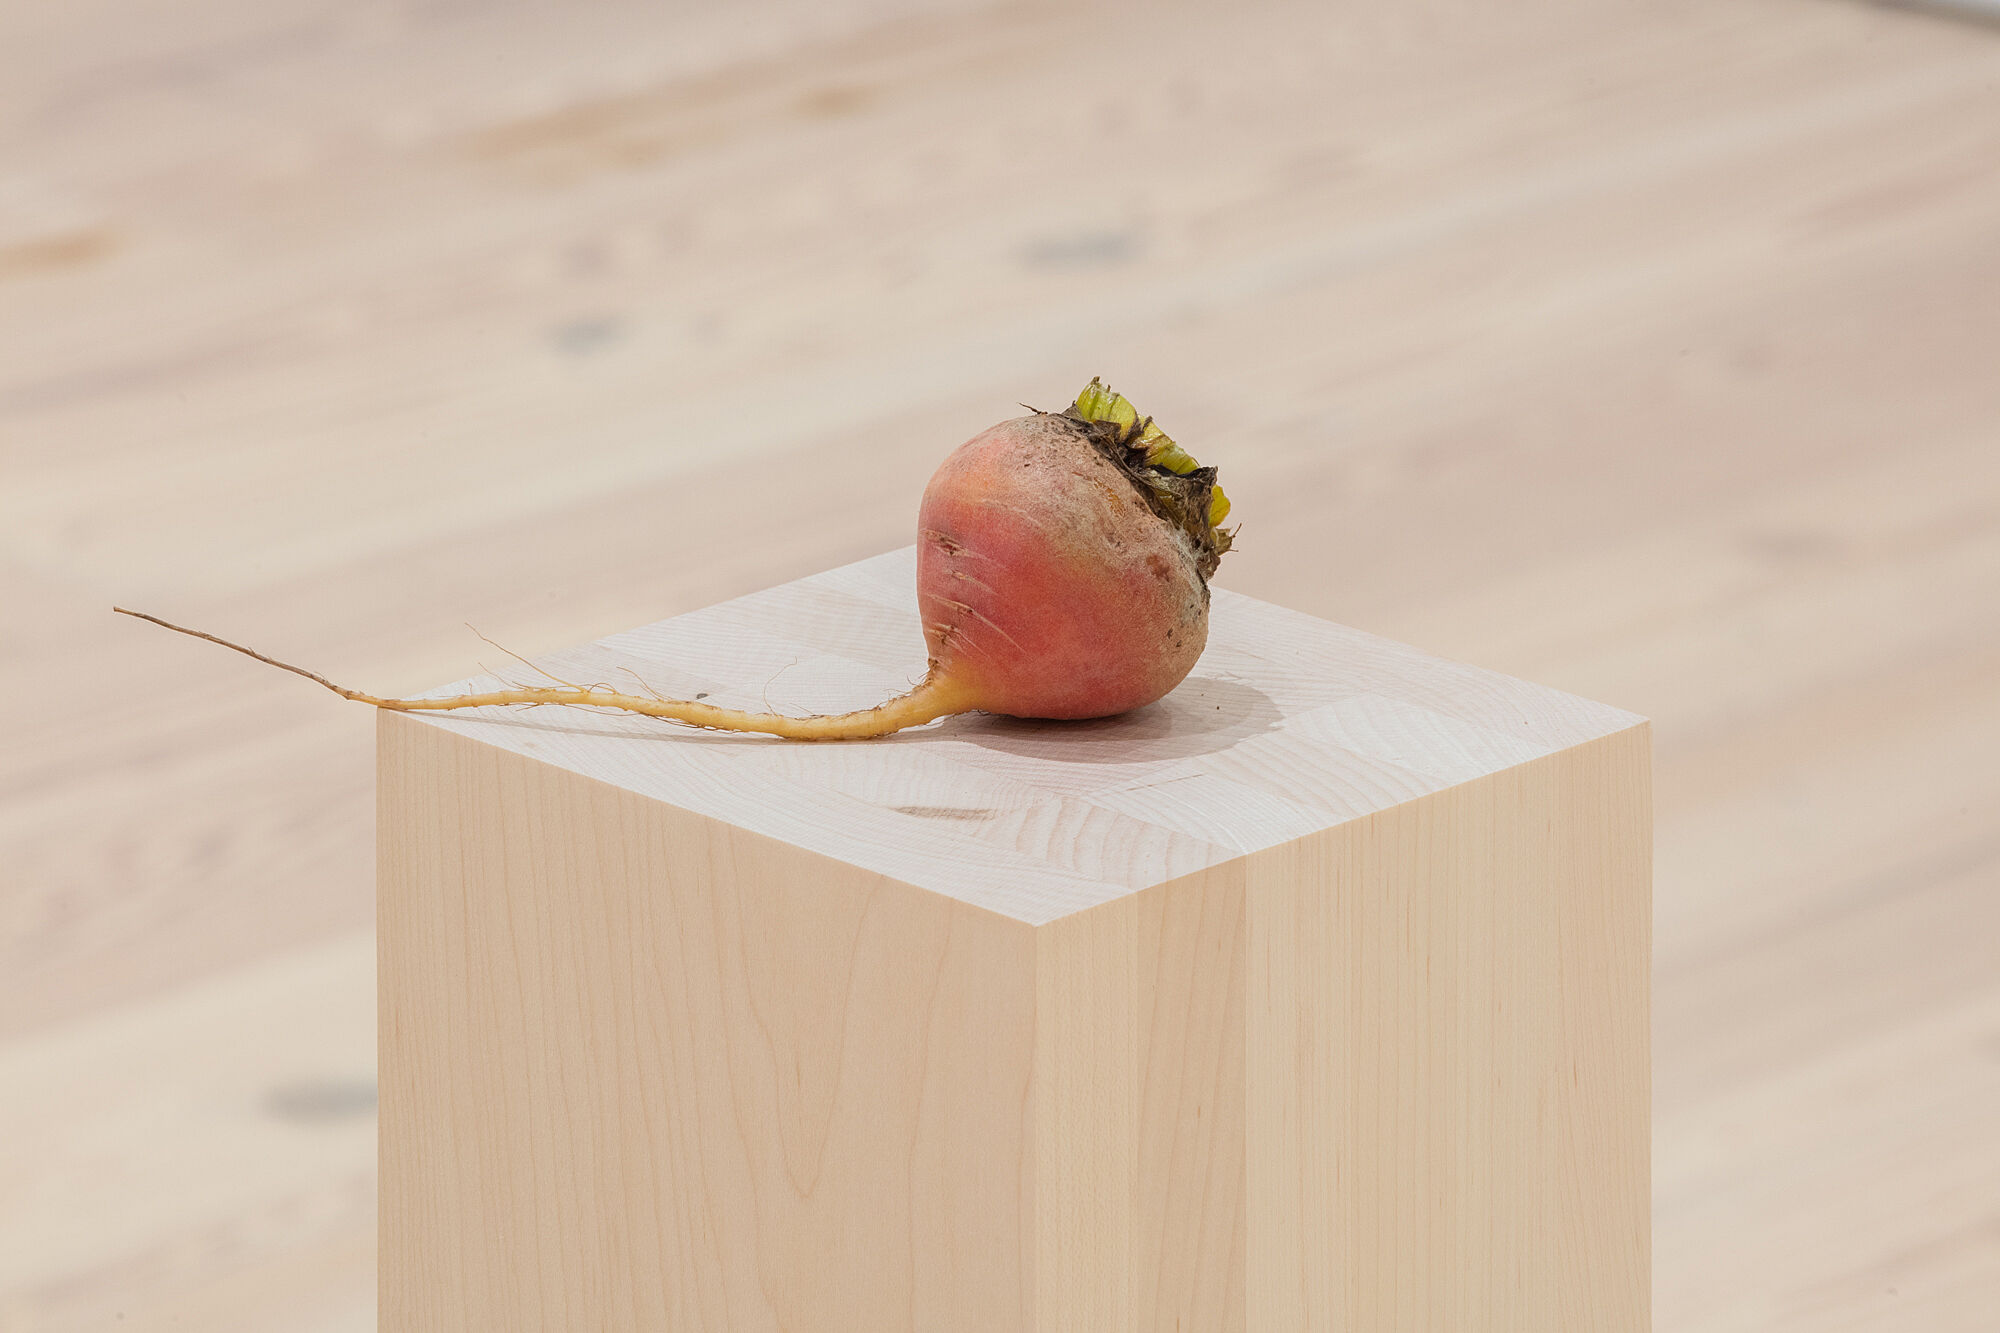 A photo of a golden beet on a plinth.